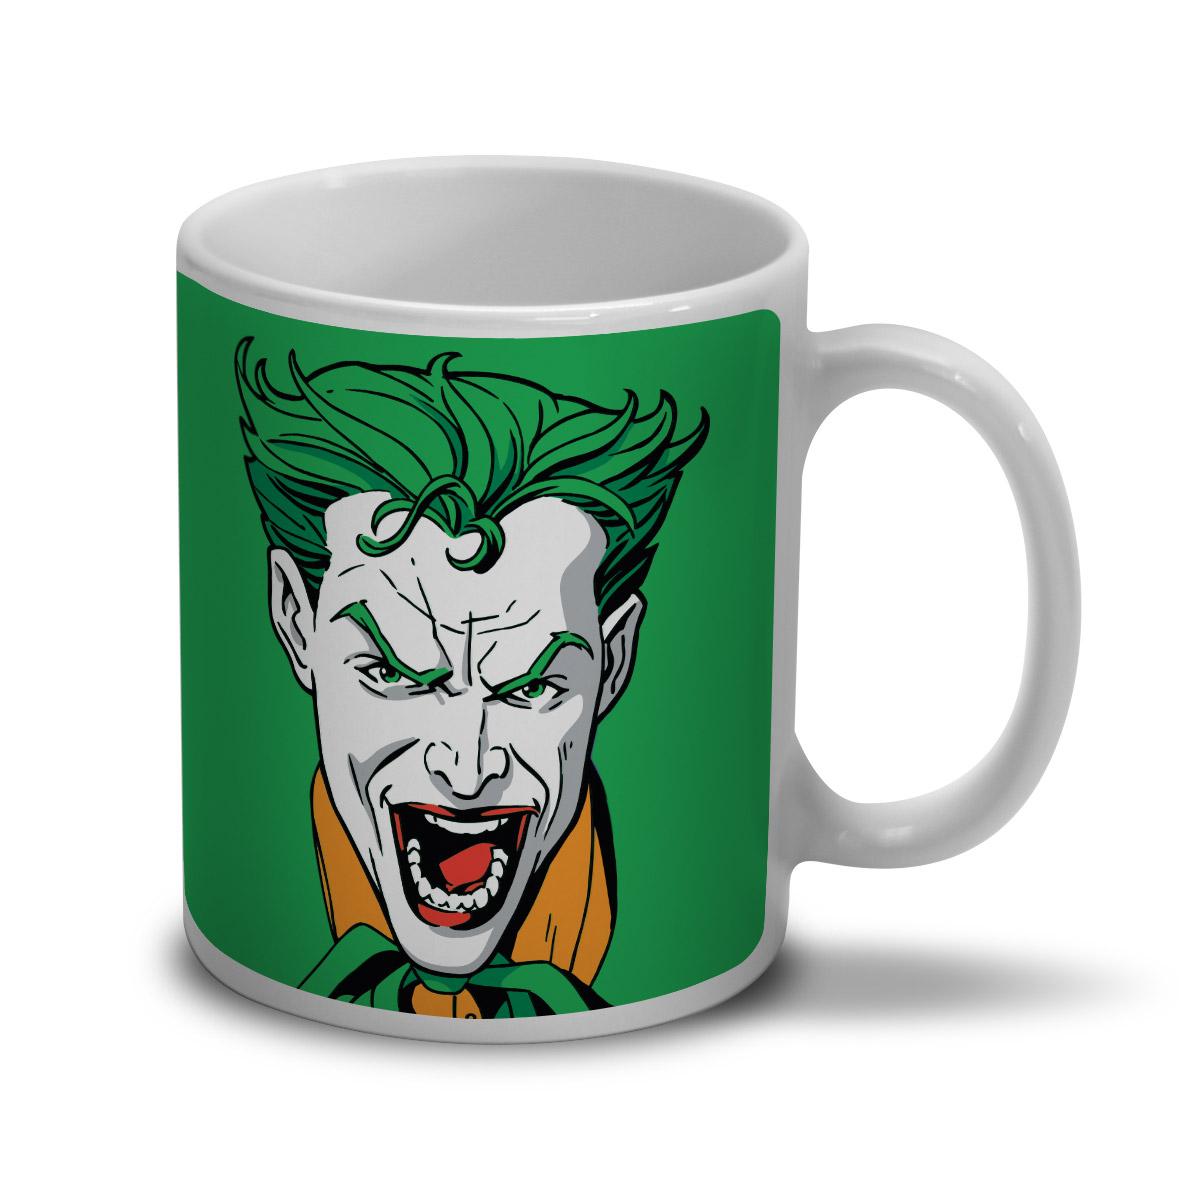 Caneca The Joker